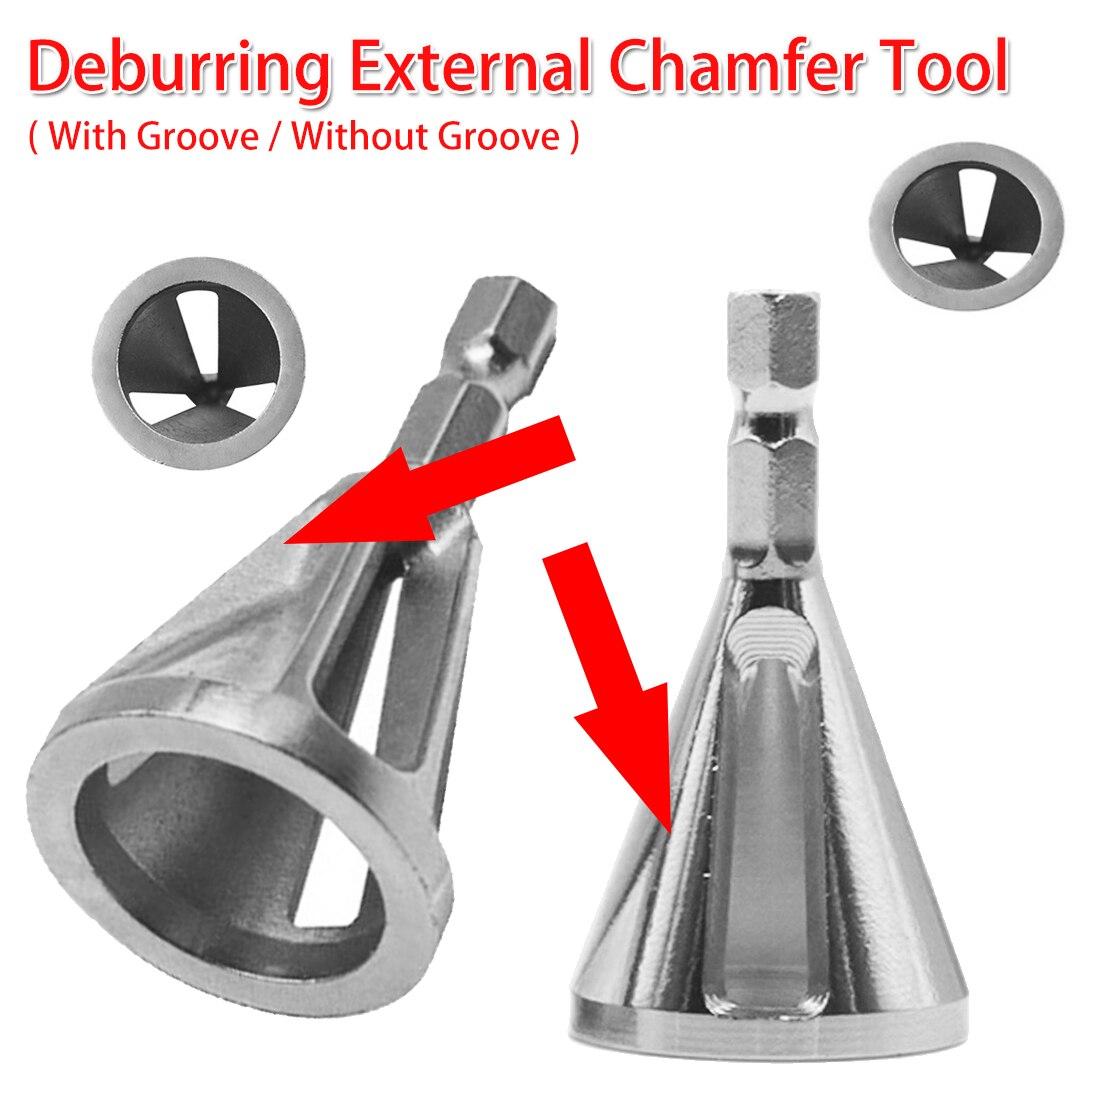 4-19mm Work Range Steel Deburring External Chamfer Tool Drill Bit Remove Burr Tire Repair Damaged Bolts Woodworking 1/4 Shank